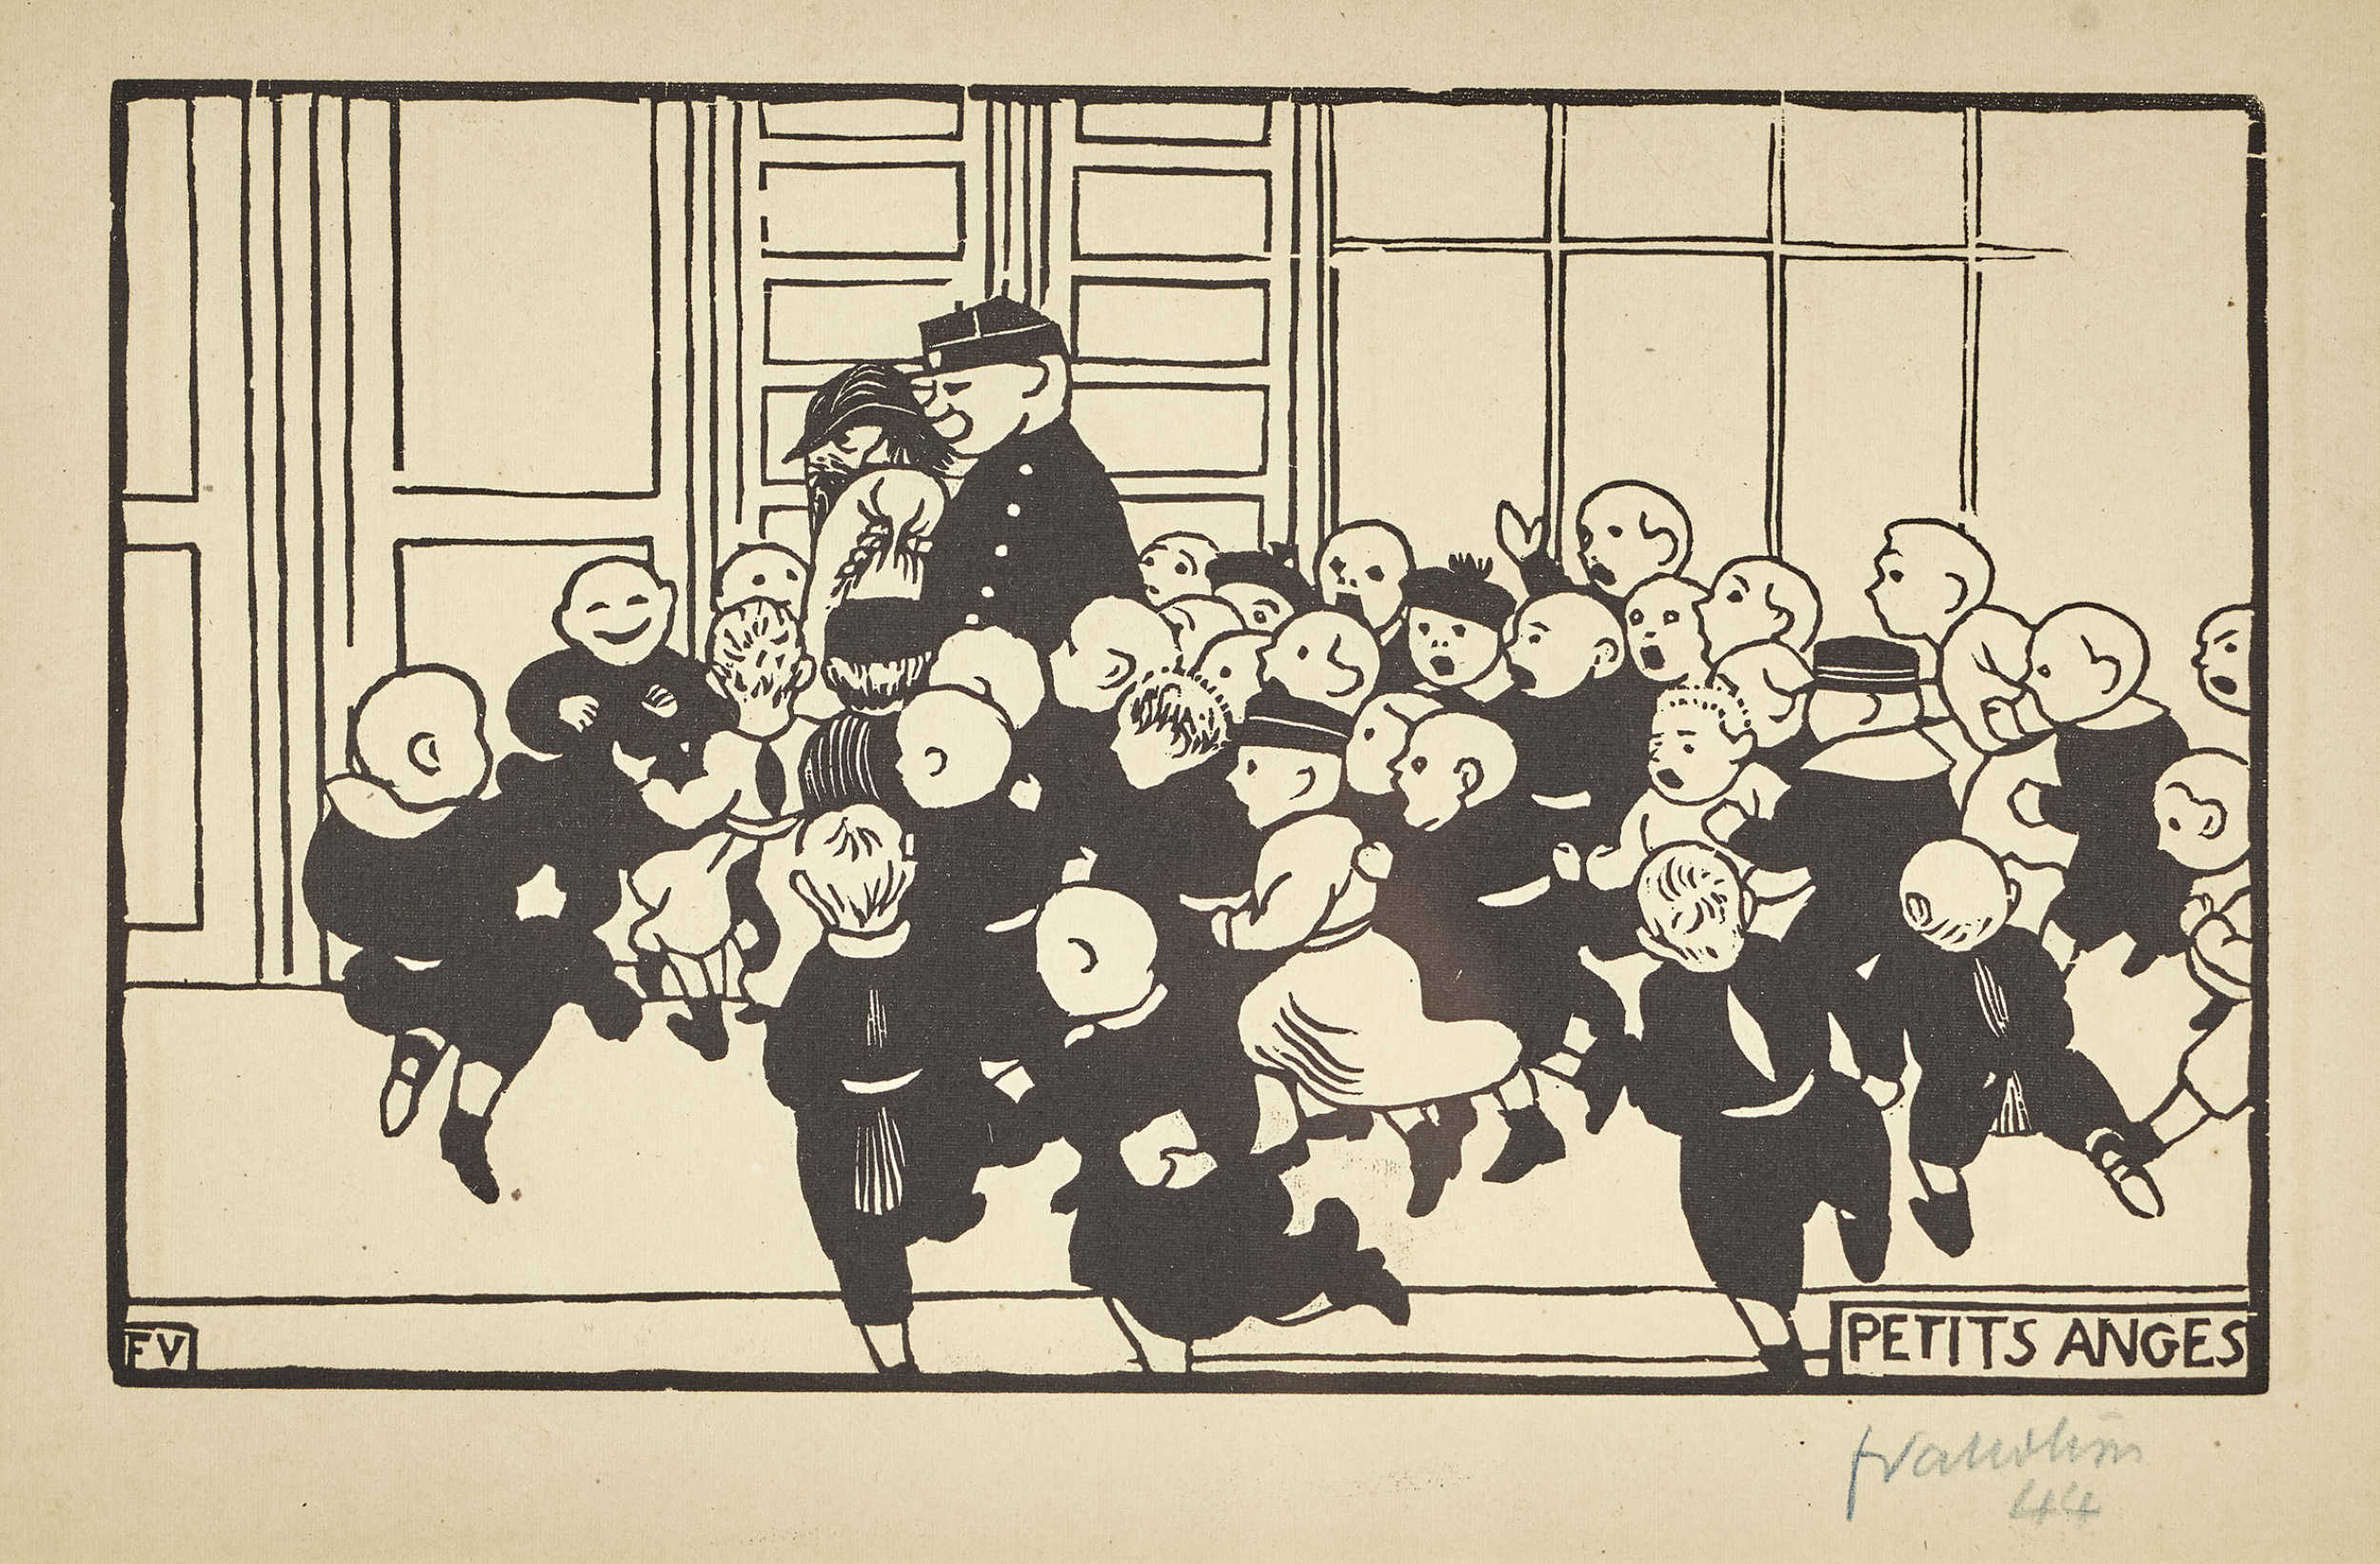 Lot 43 - VALLOTTON, FÉLIXLausanne 1865 - 1925 Neuilly-sur-SeinePetits anges.Holzschnitt,im Stock mgr. u.l.,